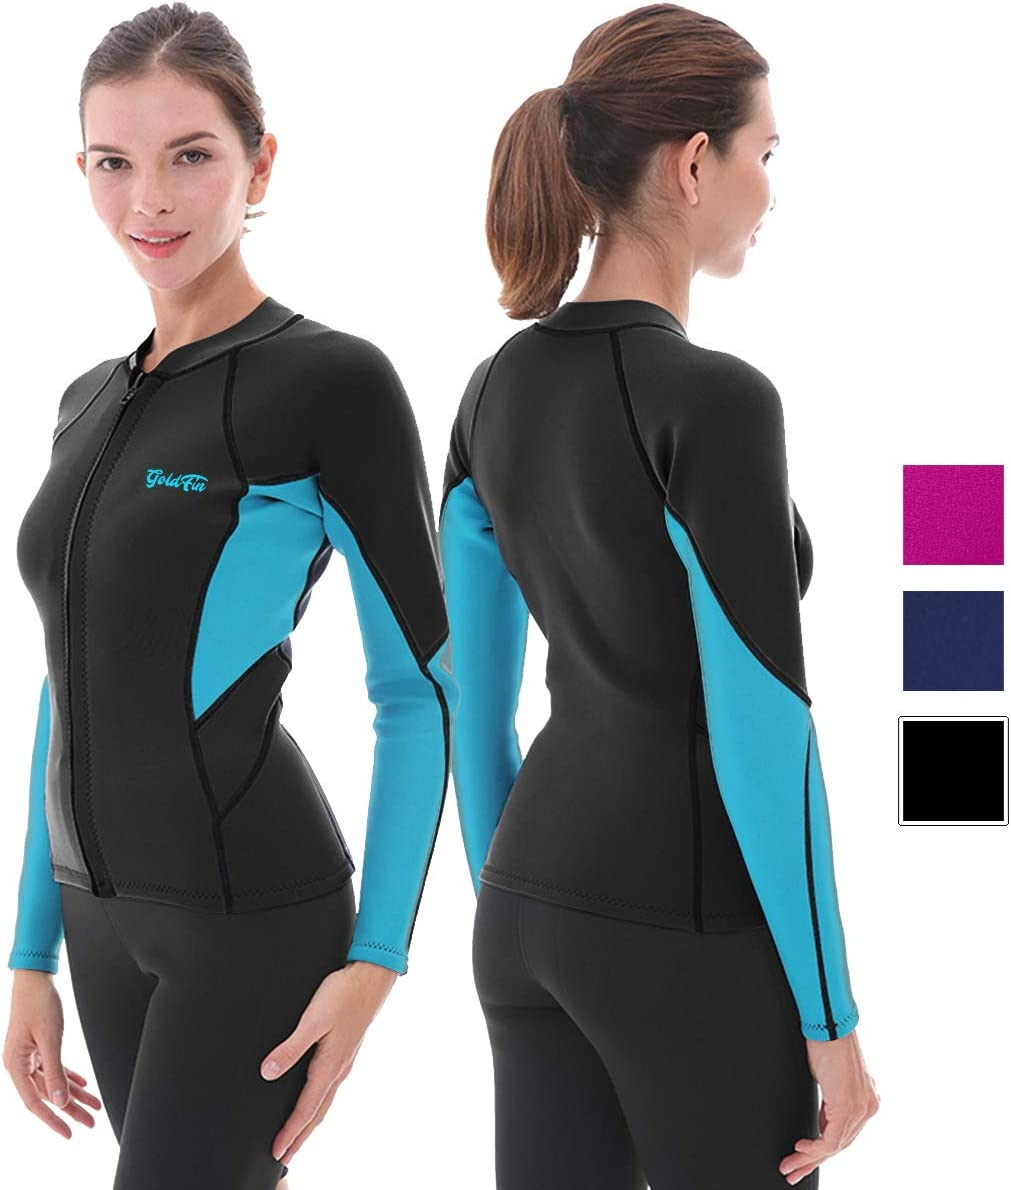 GoldFin Women's Wetsuit Top, 2mm Neoprene Wetsuit Jacket Long Sleeve Front Zip Wetsuit Shirt for Swimming Water Aerobics Diving Surfing Kayaking